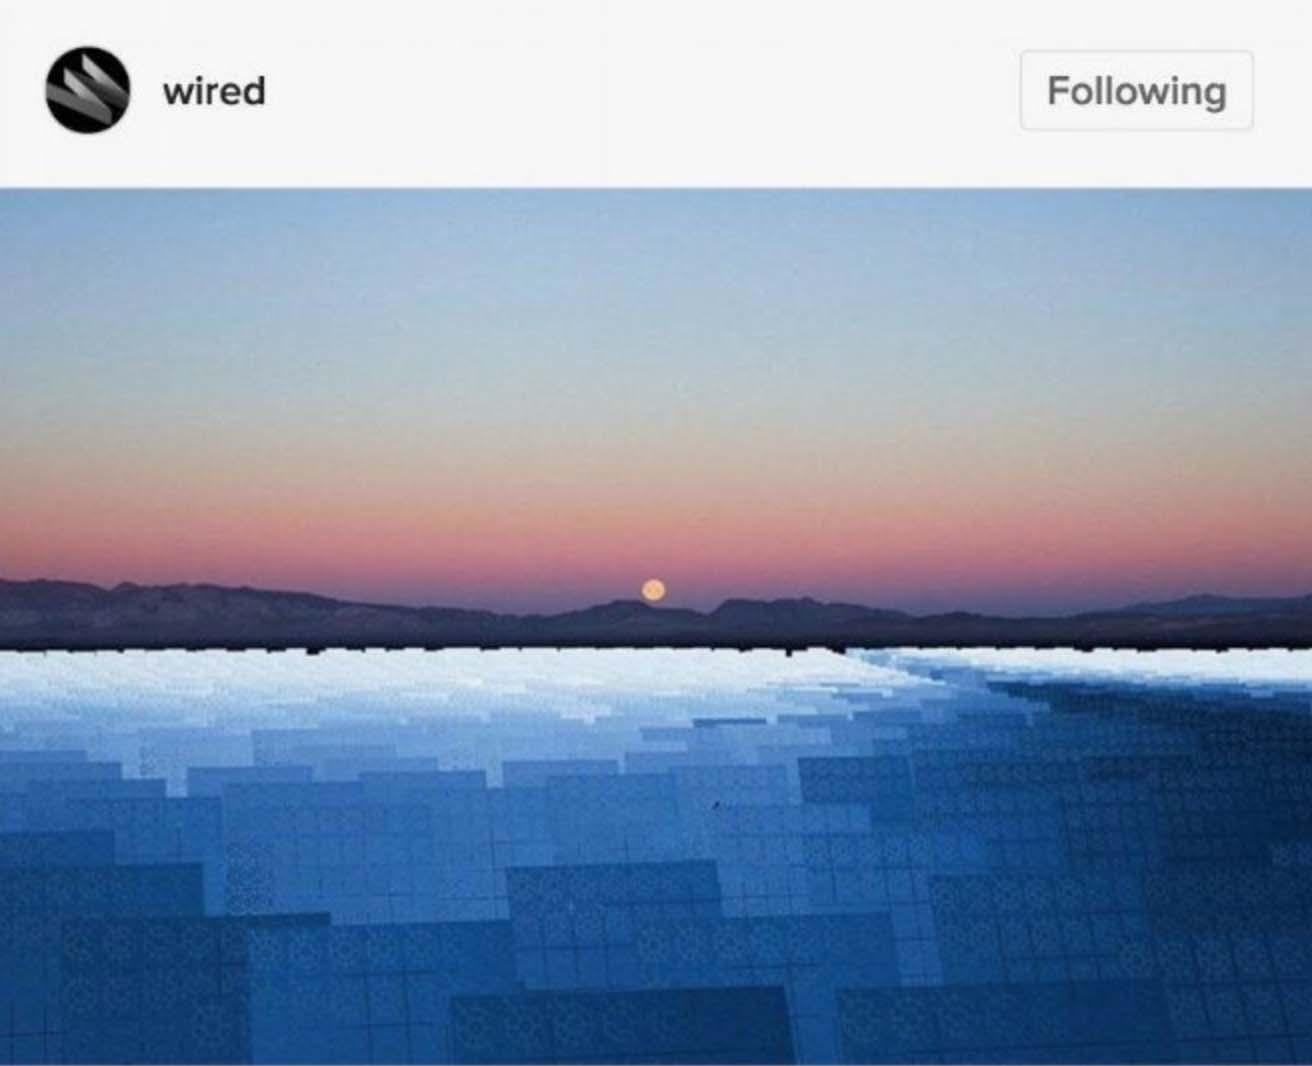 Copywriting: WIRED